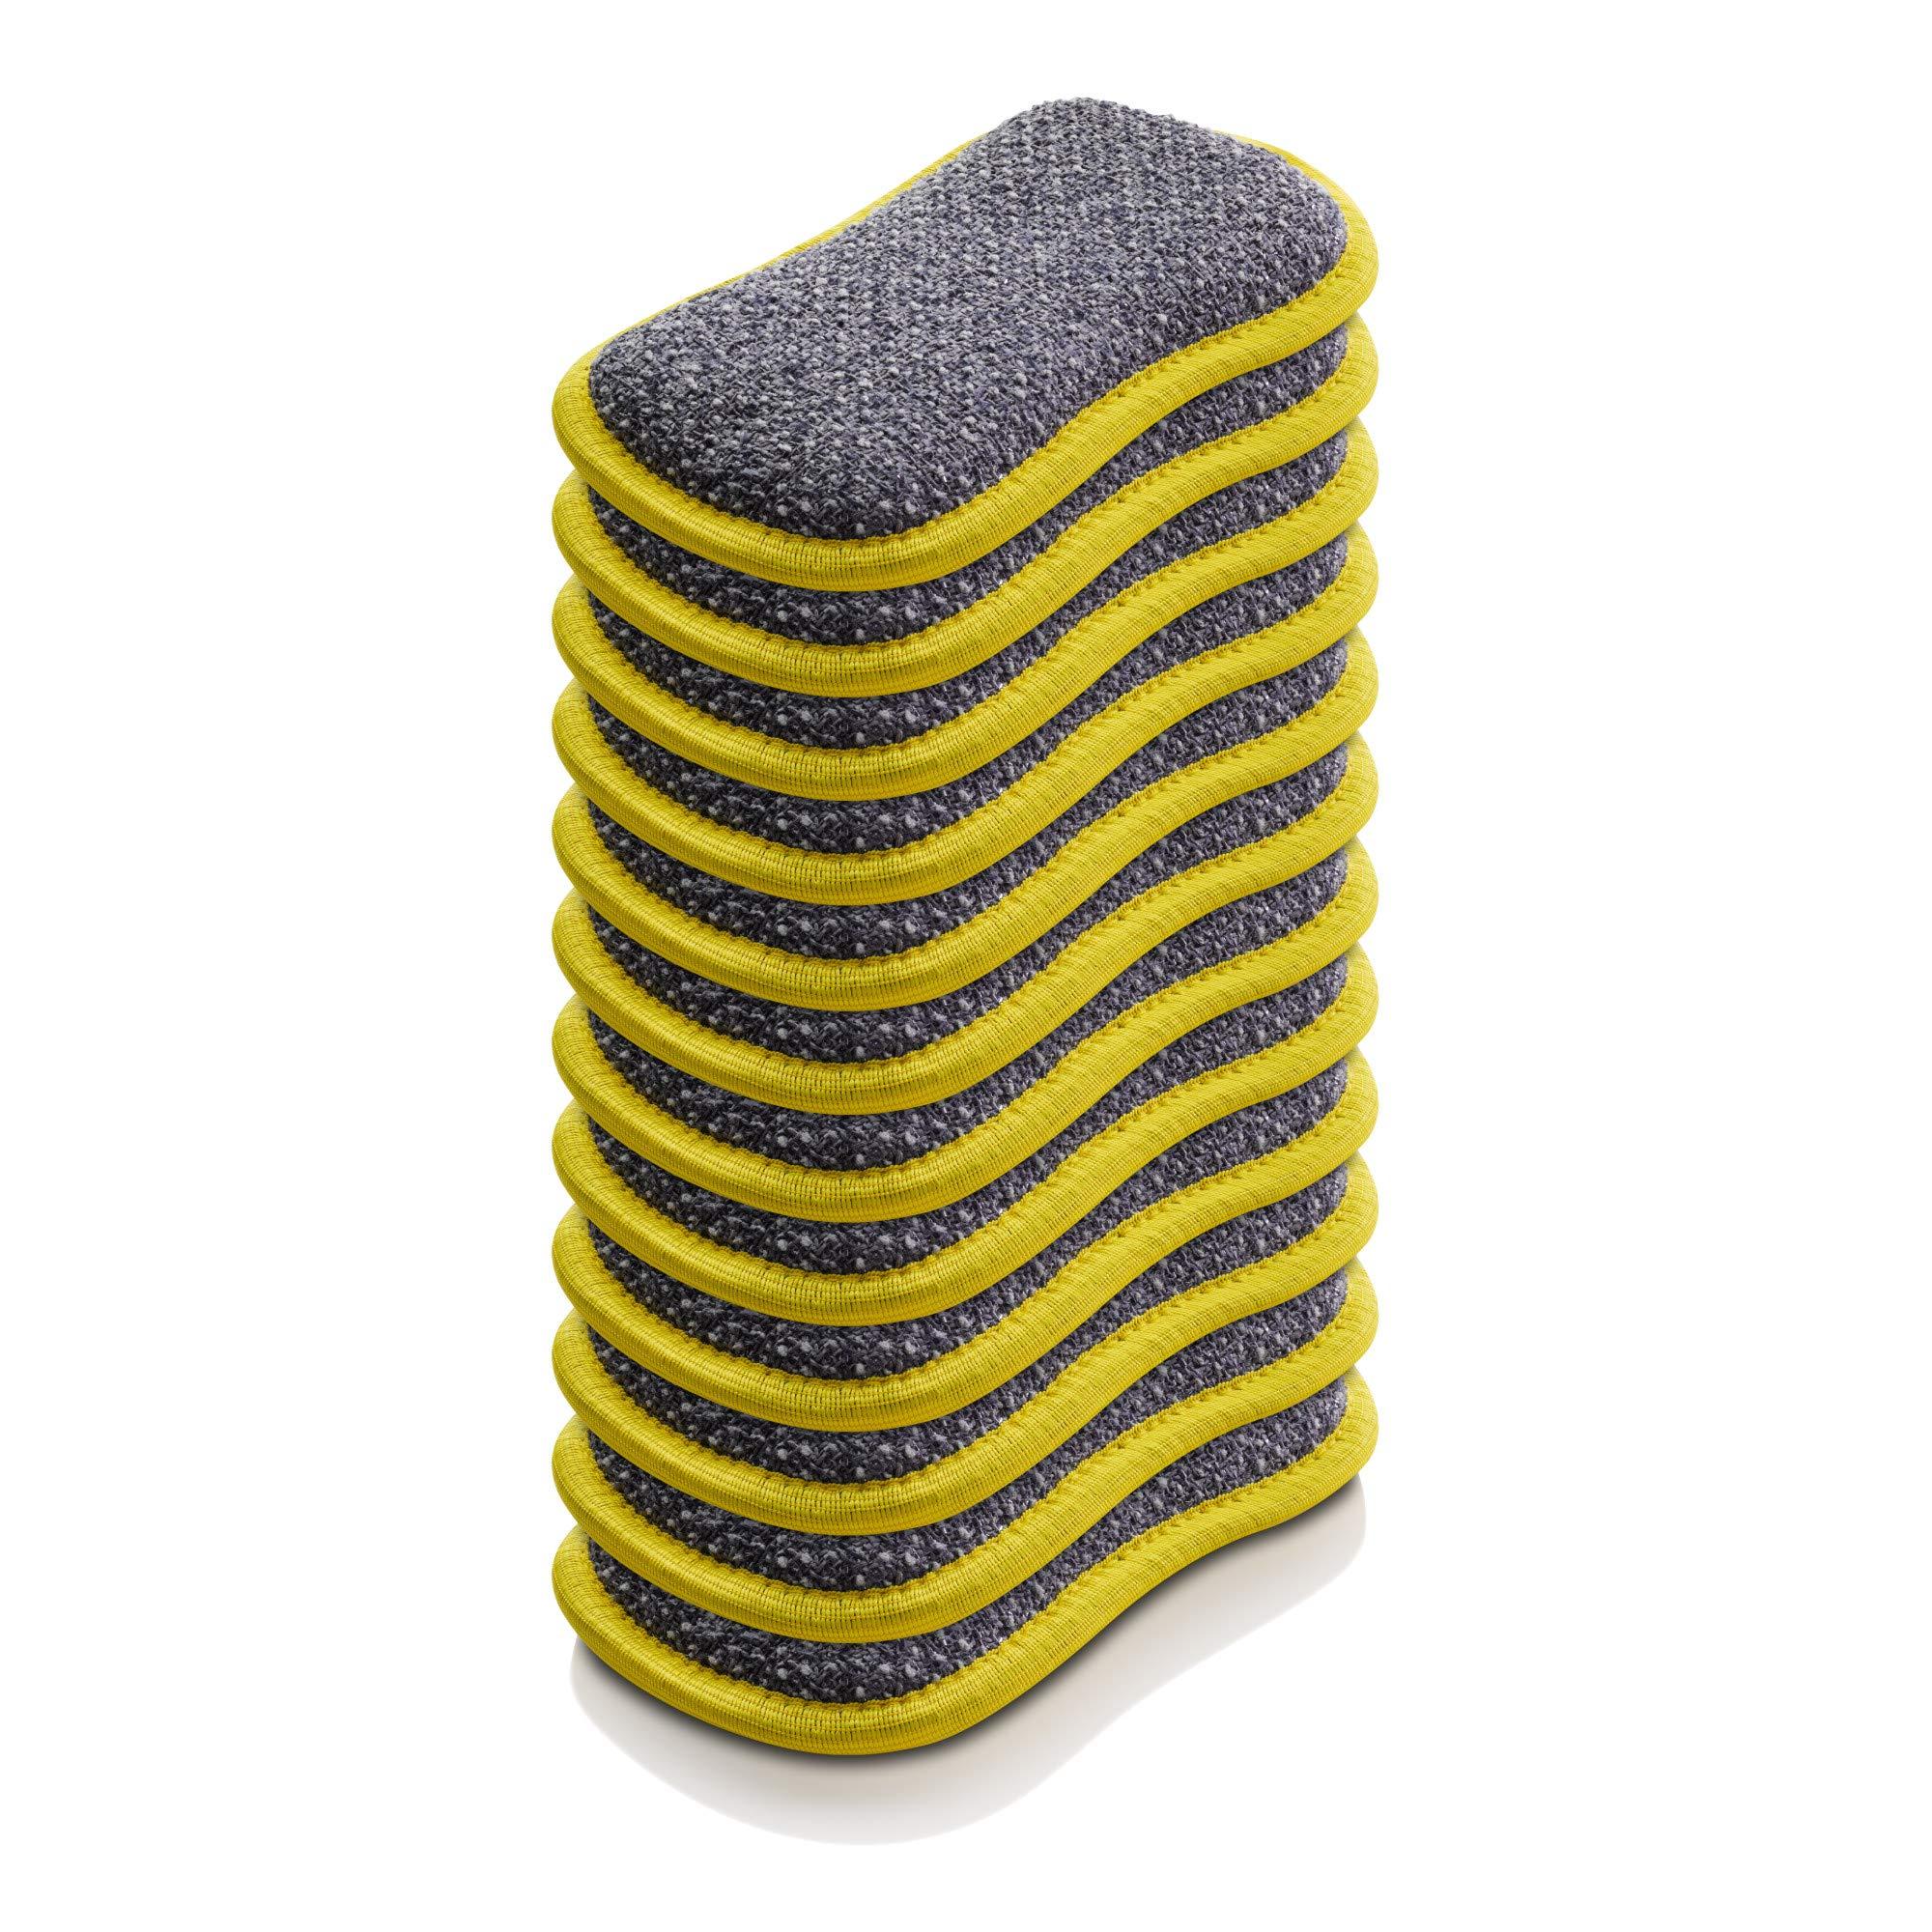 E-Cloth Microfiber Dual Purpose Washing Up Pad, Yellow, 12 Count by E-Cloth